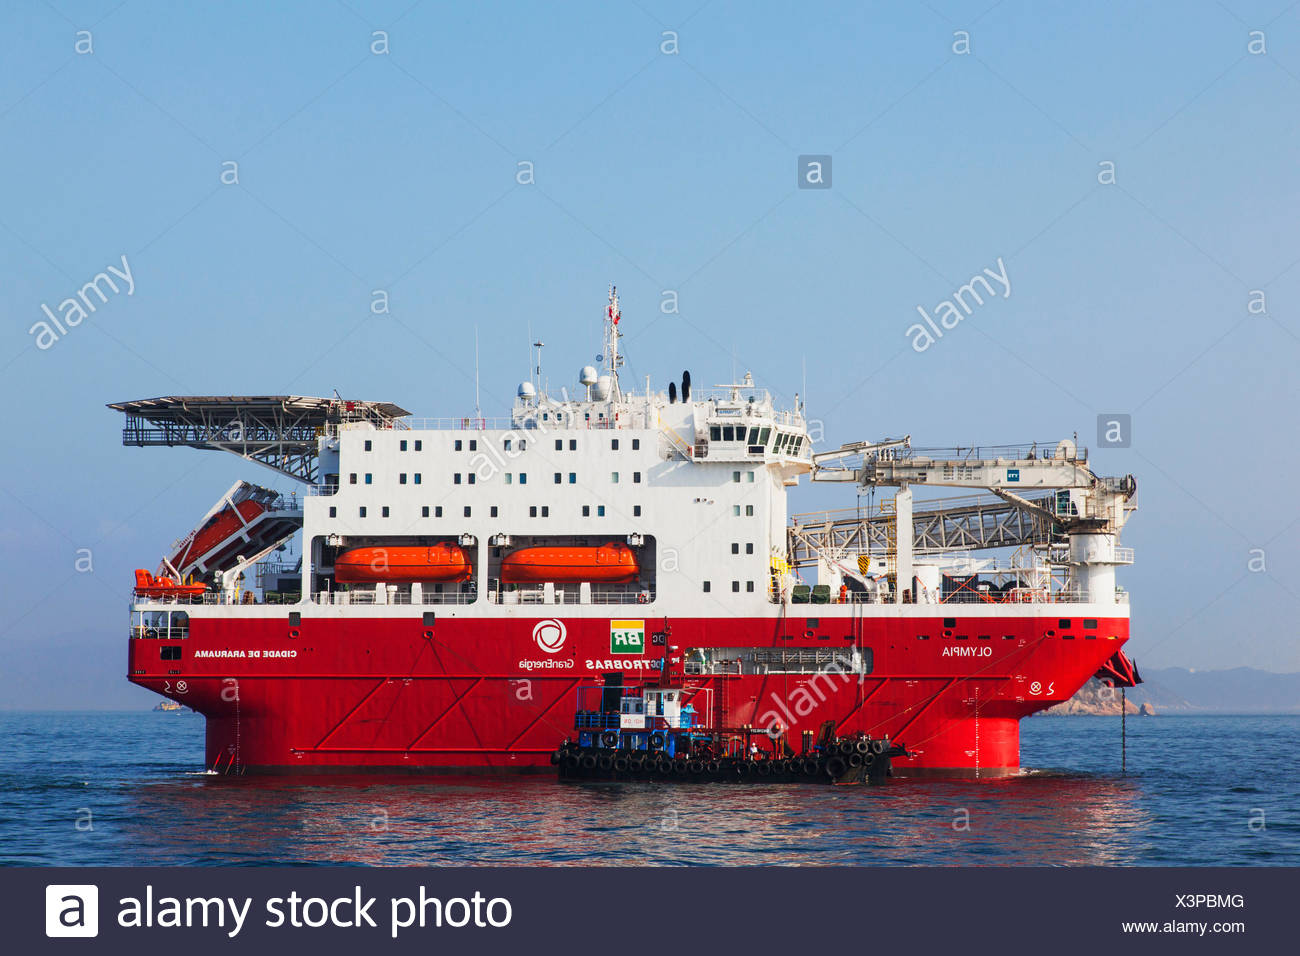 La Chine, Hong Kong, l'Olympia, semi-submersible Compact Unité de soutien Ocean Rig Photo Stock